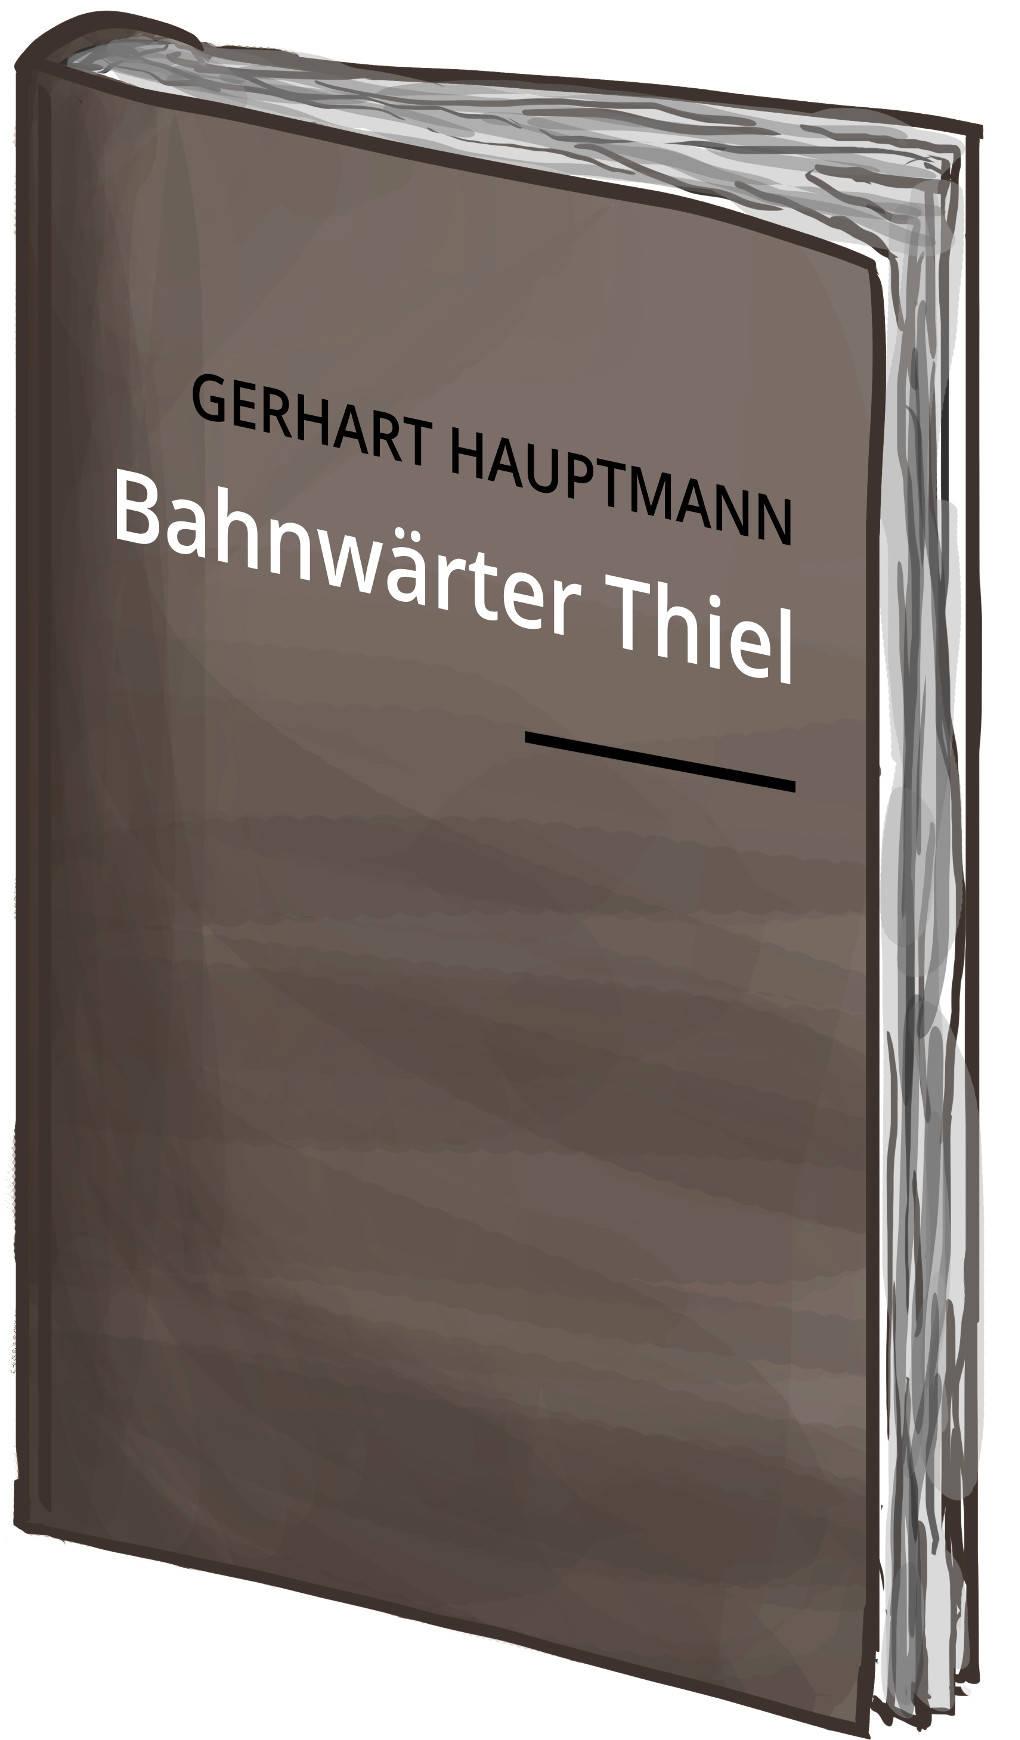 Bahnwärter Thiel